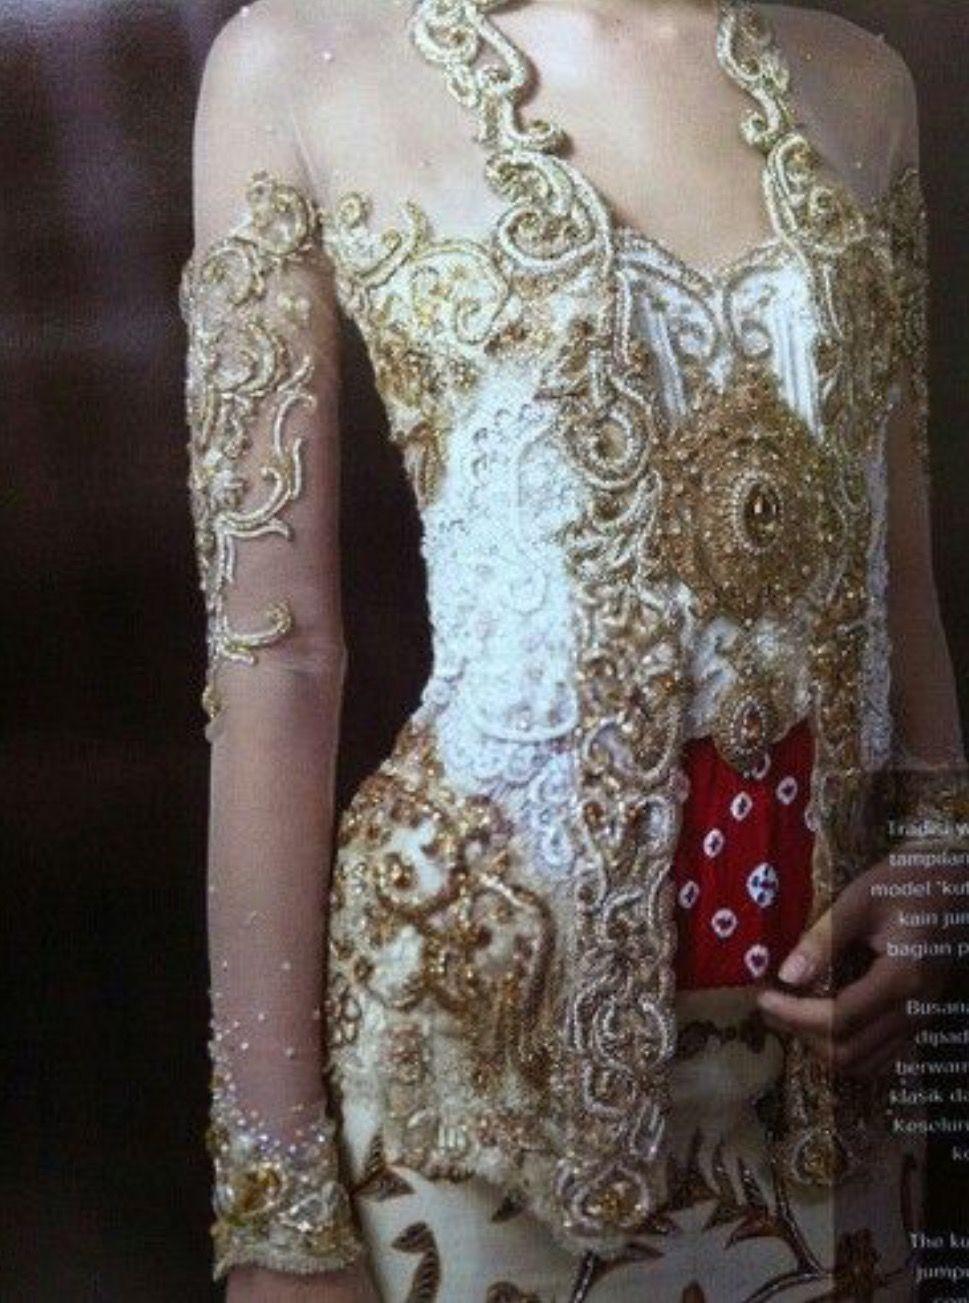 Kebaya, kutu baru, brokat, emas, putih, beads, stagen